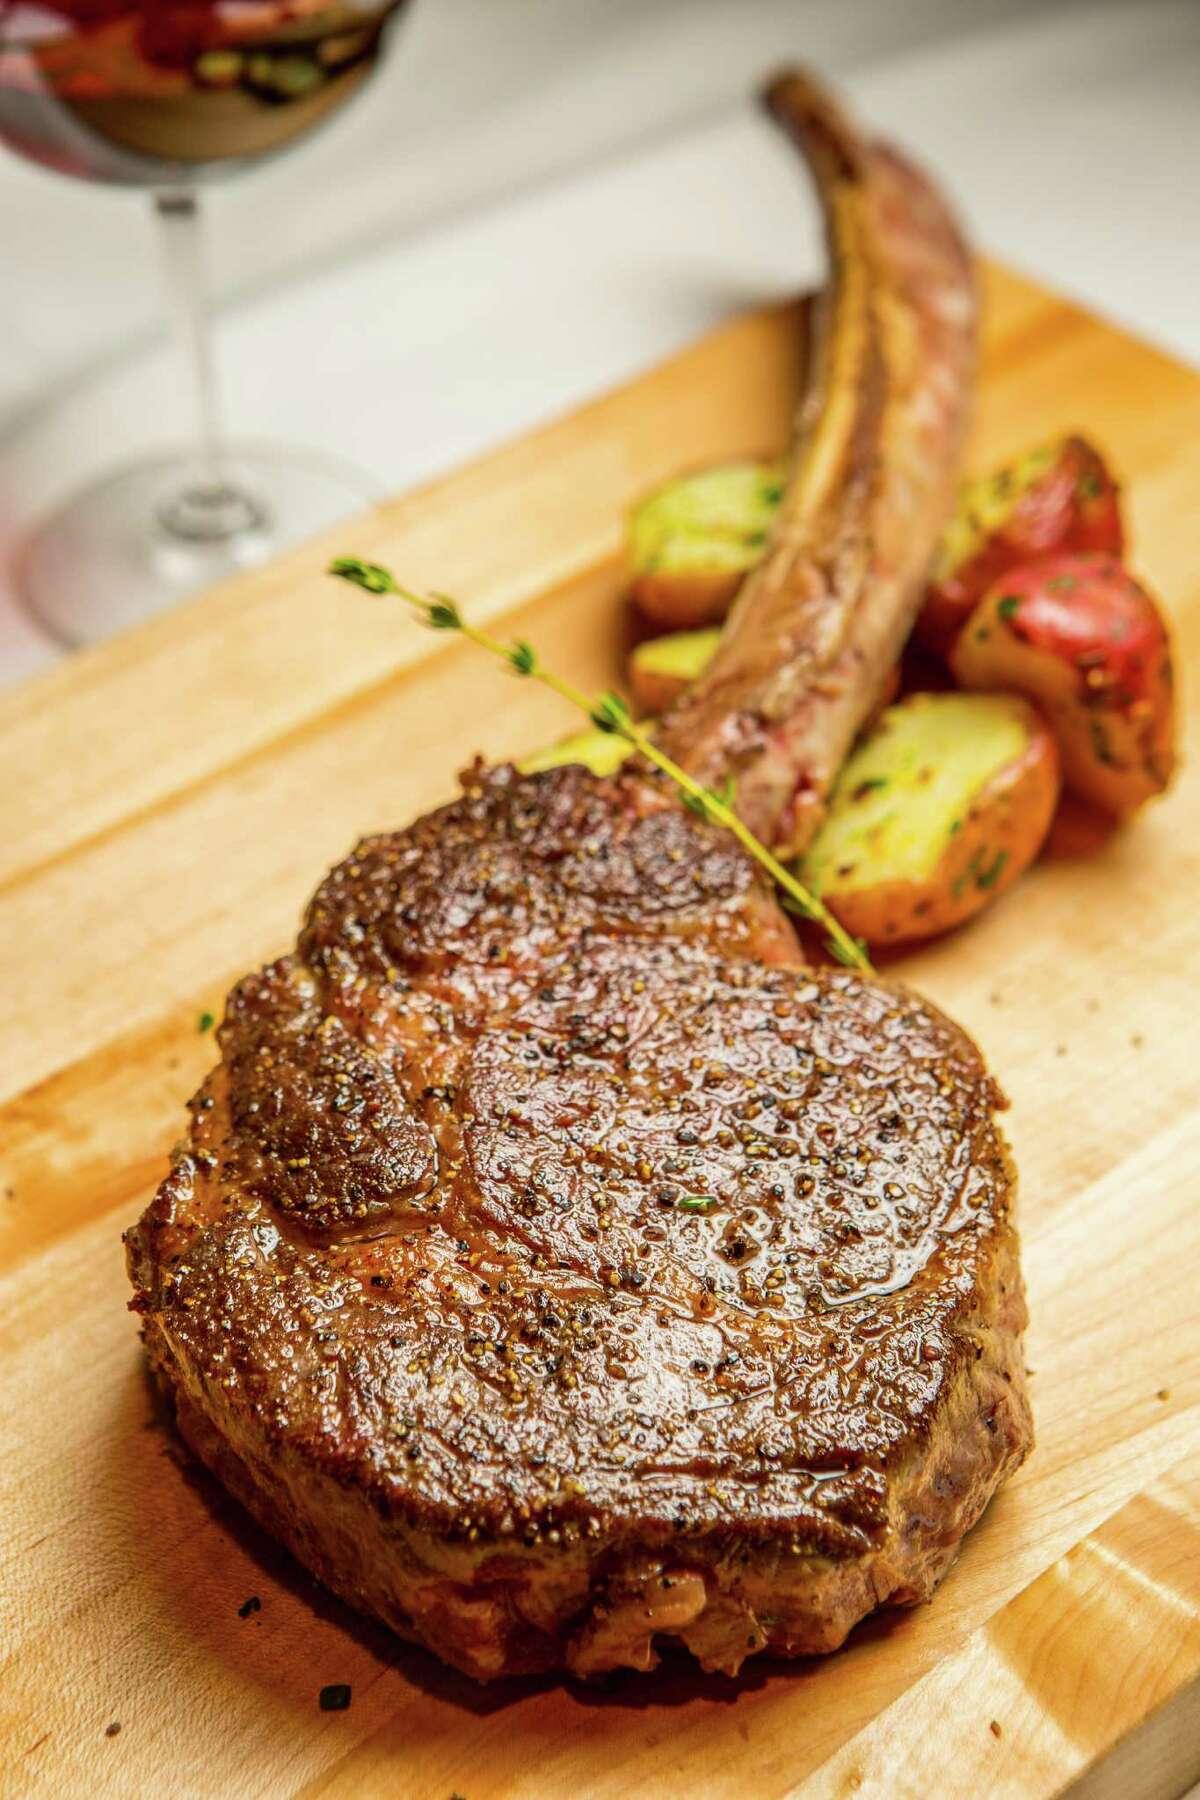 Killen's Steakhouse in Pearland serves American Wagyu long-bone rib-eye.